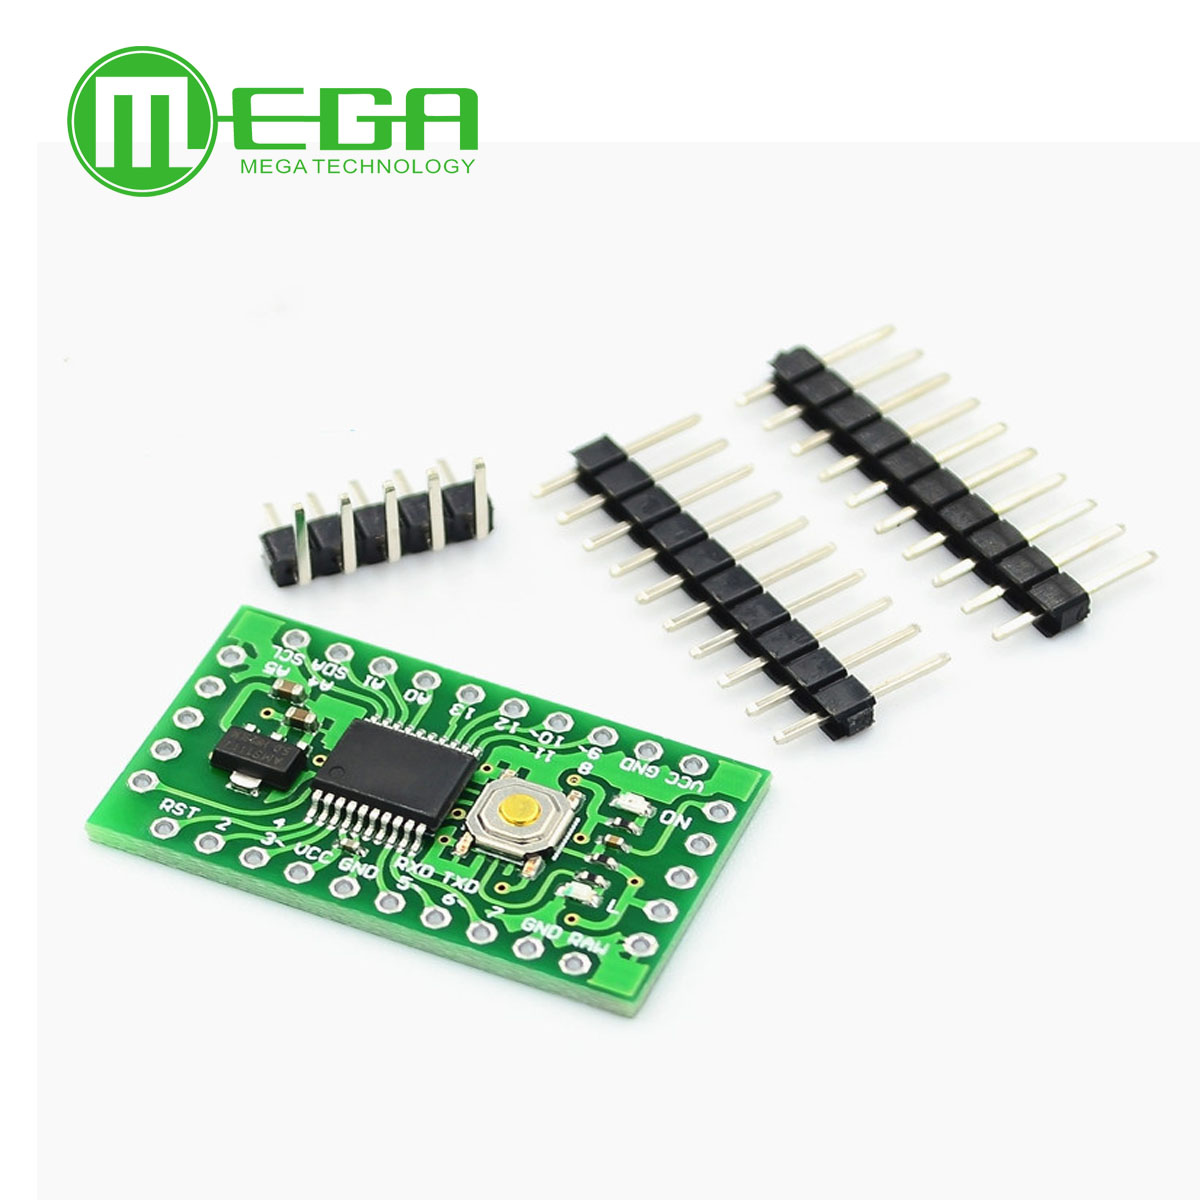 Новый LGT8F328P-SSOP20 MiniEVB заменяет rduino Pro Mini ATMEGA328P